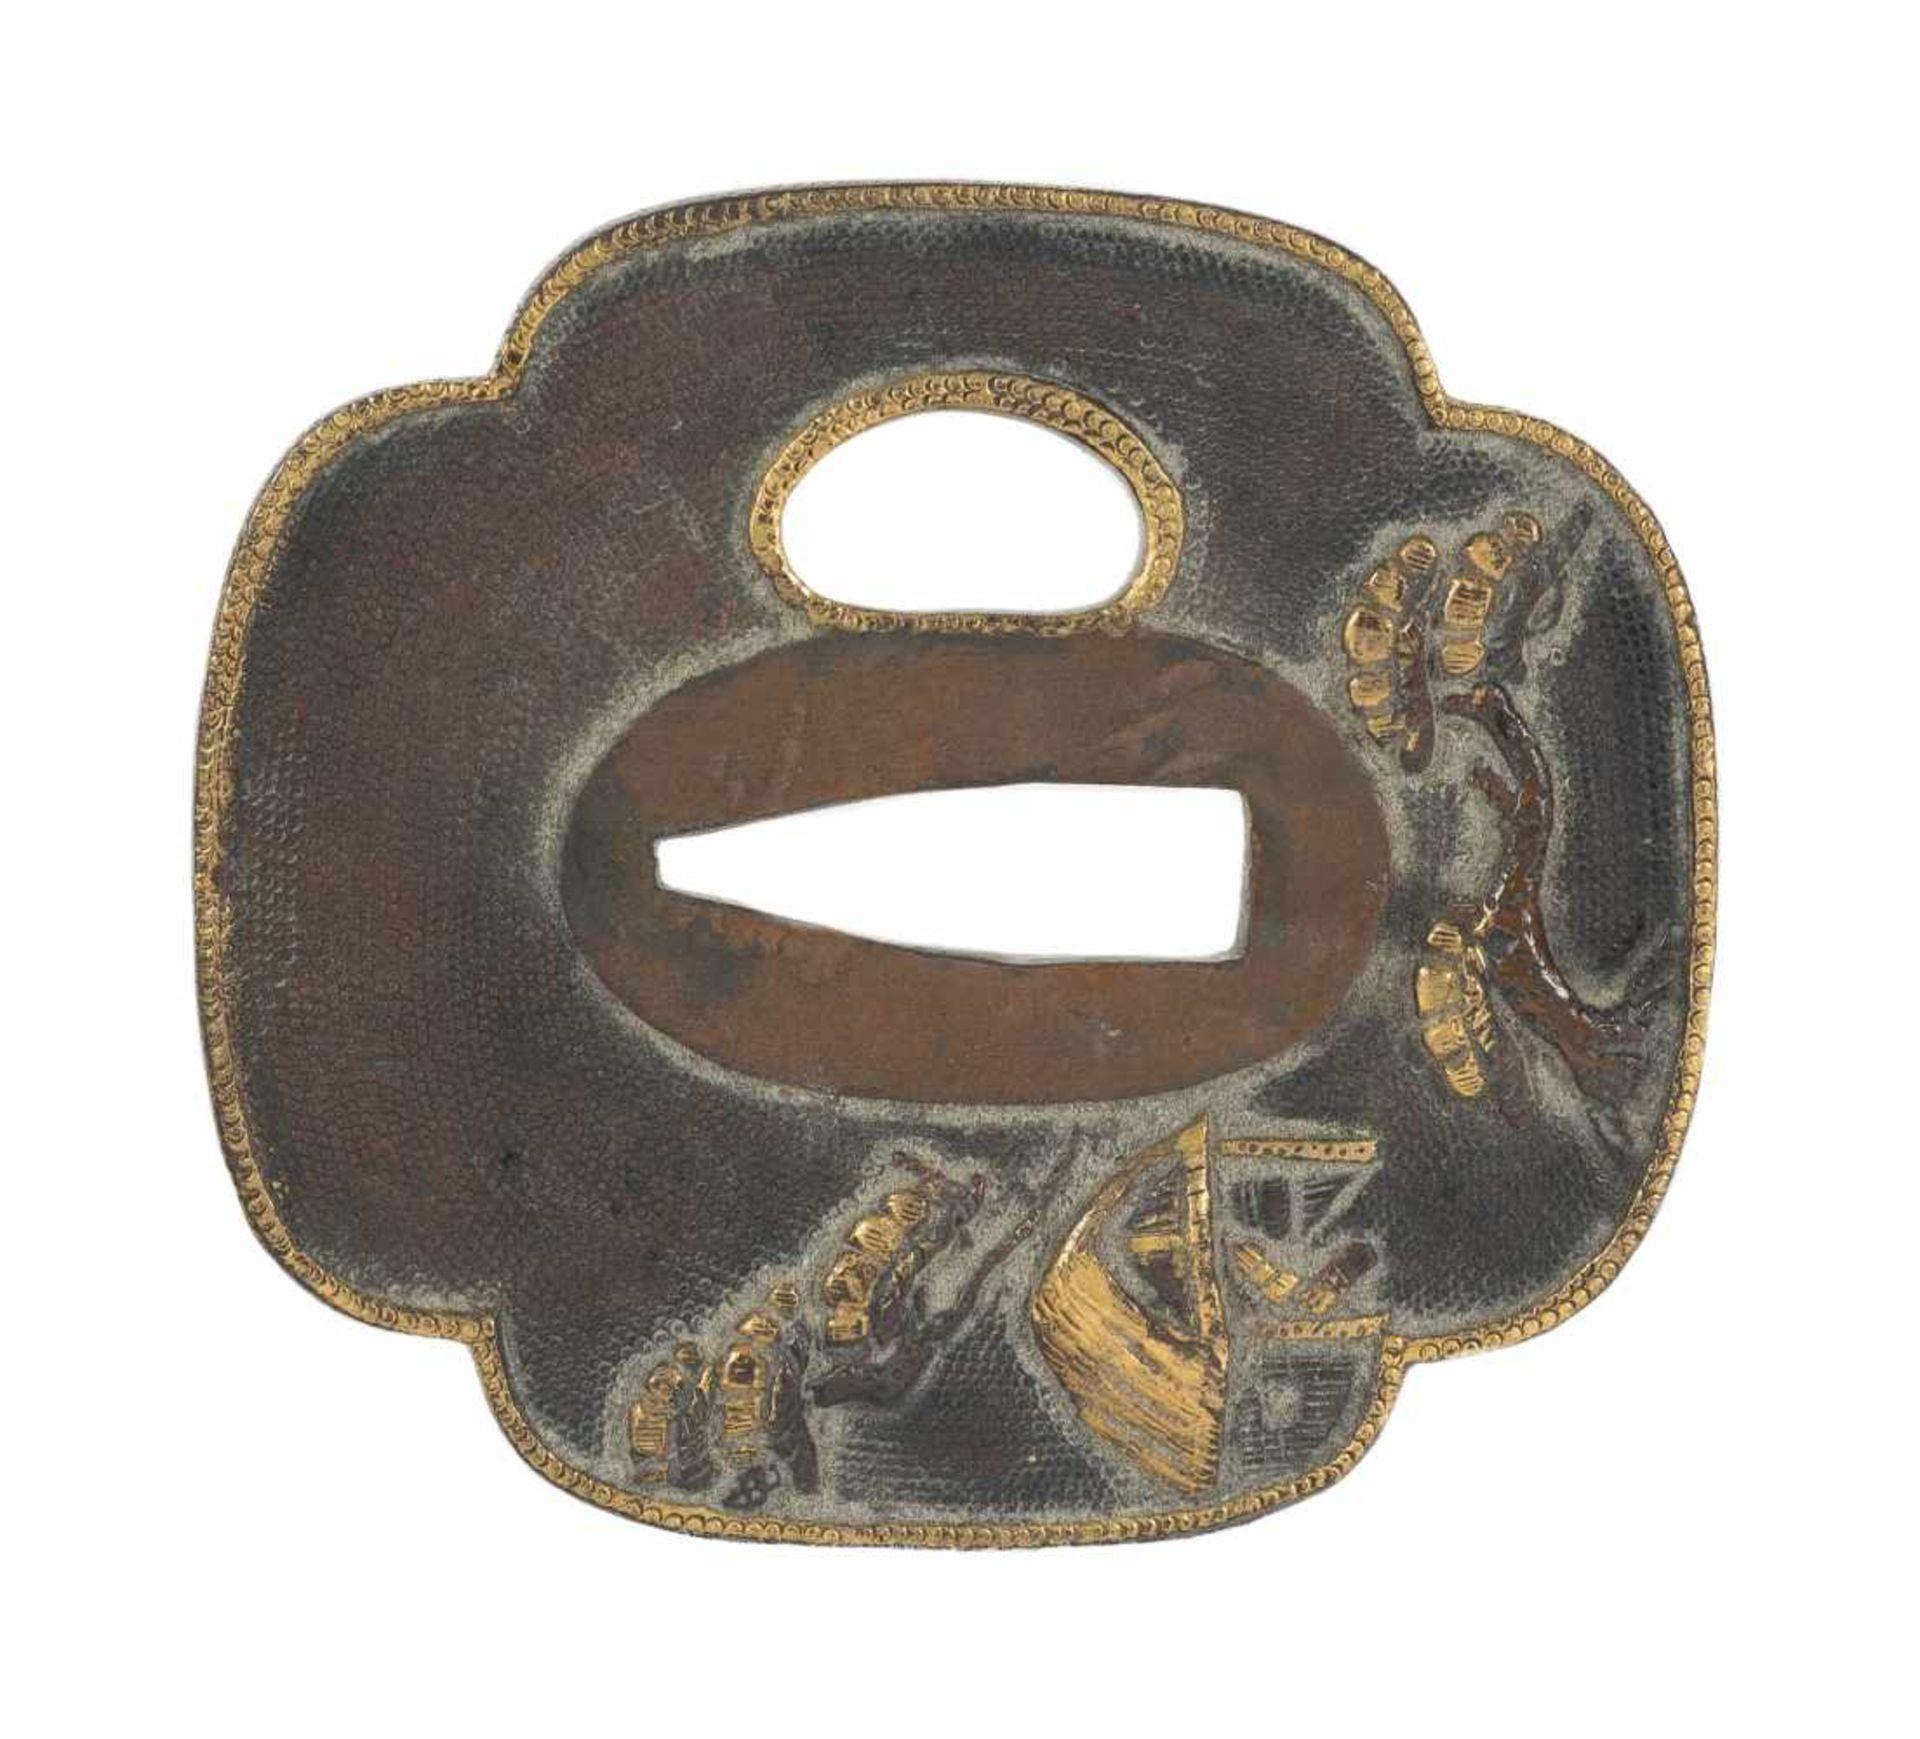 Los 35 - A shibuichi shakudo mokko tsuba (sword guard). Japan. Edo period. 18th-19th Centuries. 6,5 x 6